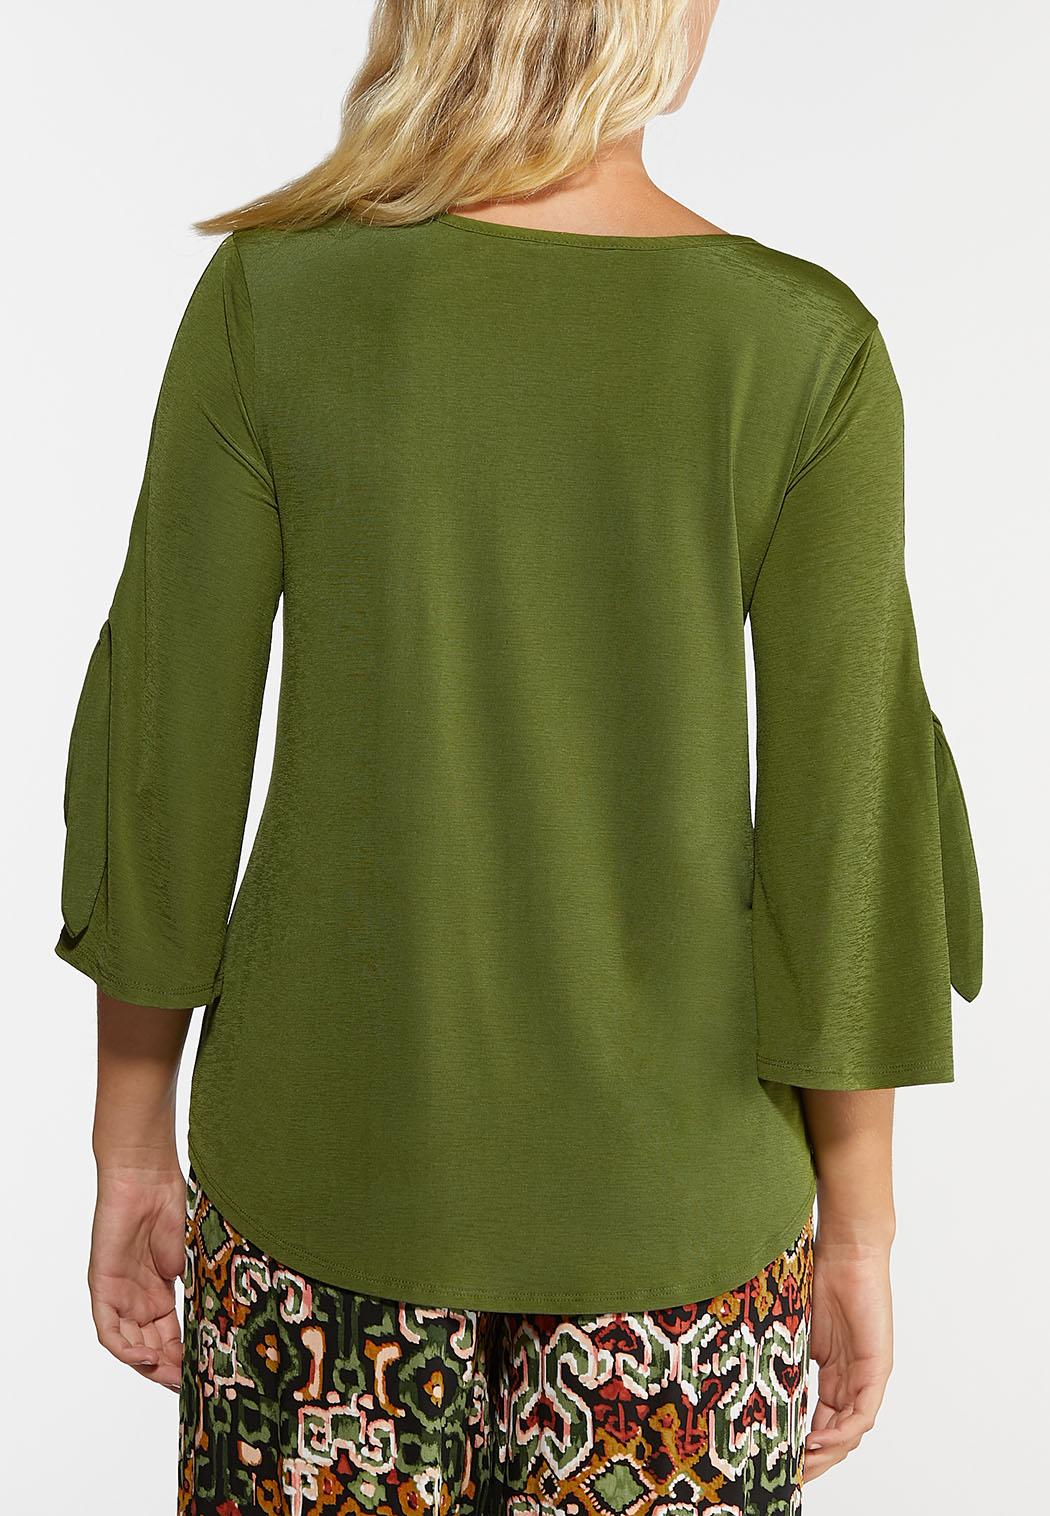 Green Tie Sleeve Top (Item #44367446)